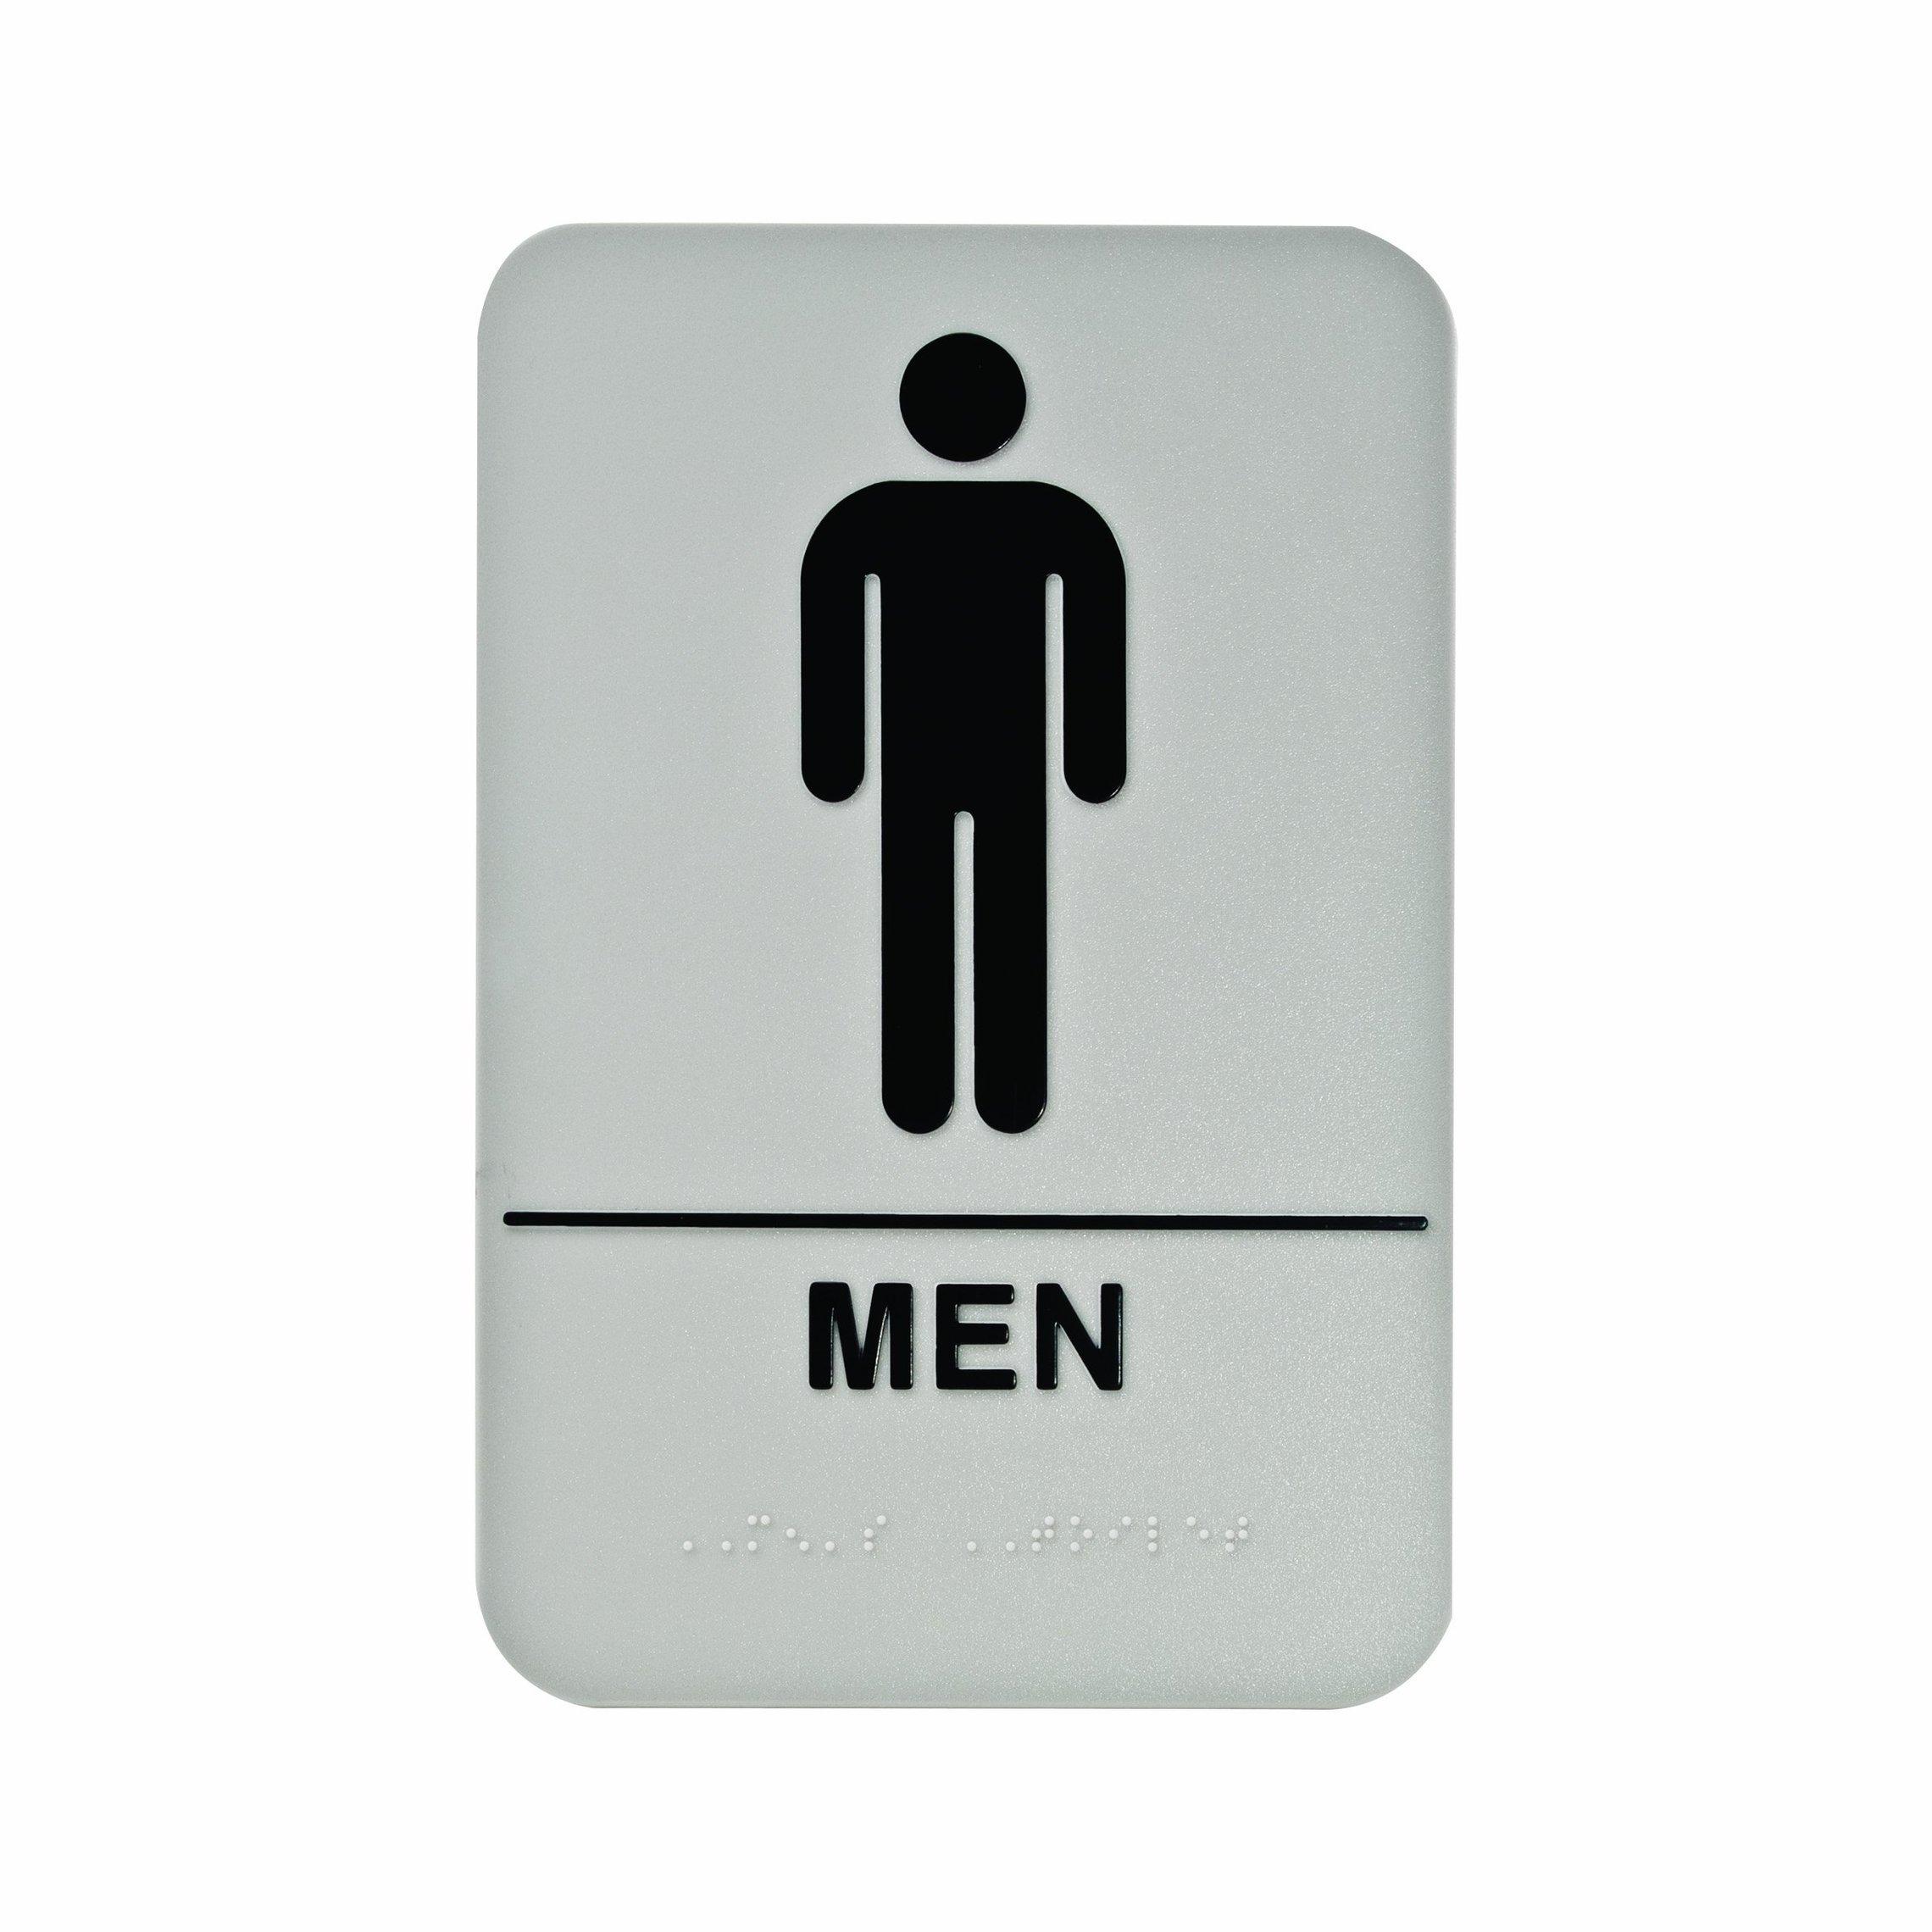 Men Restroom Symbol Clipart Free to use Clip Art Resource  Male Bathroom  Symbol ClipArt Best. Male Washroom Symbol